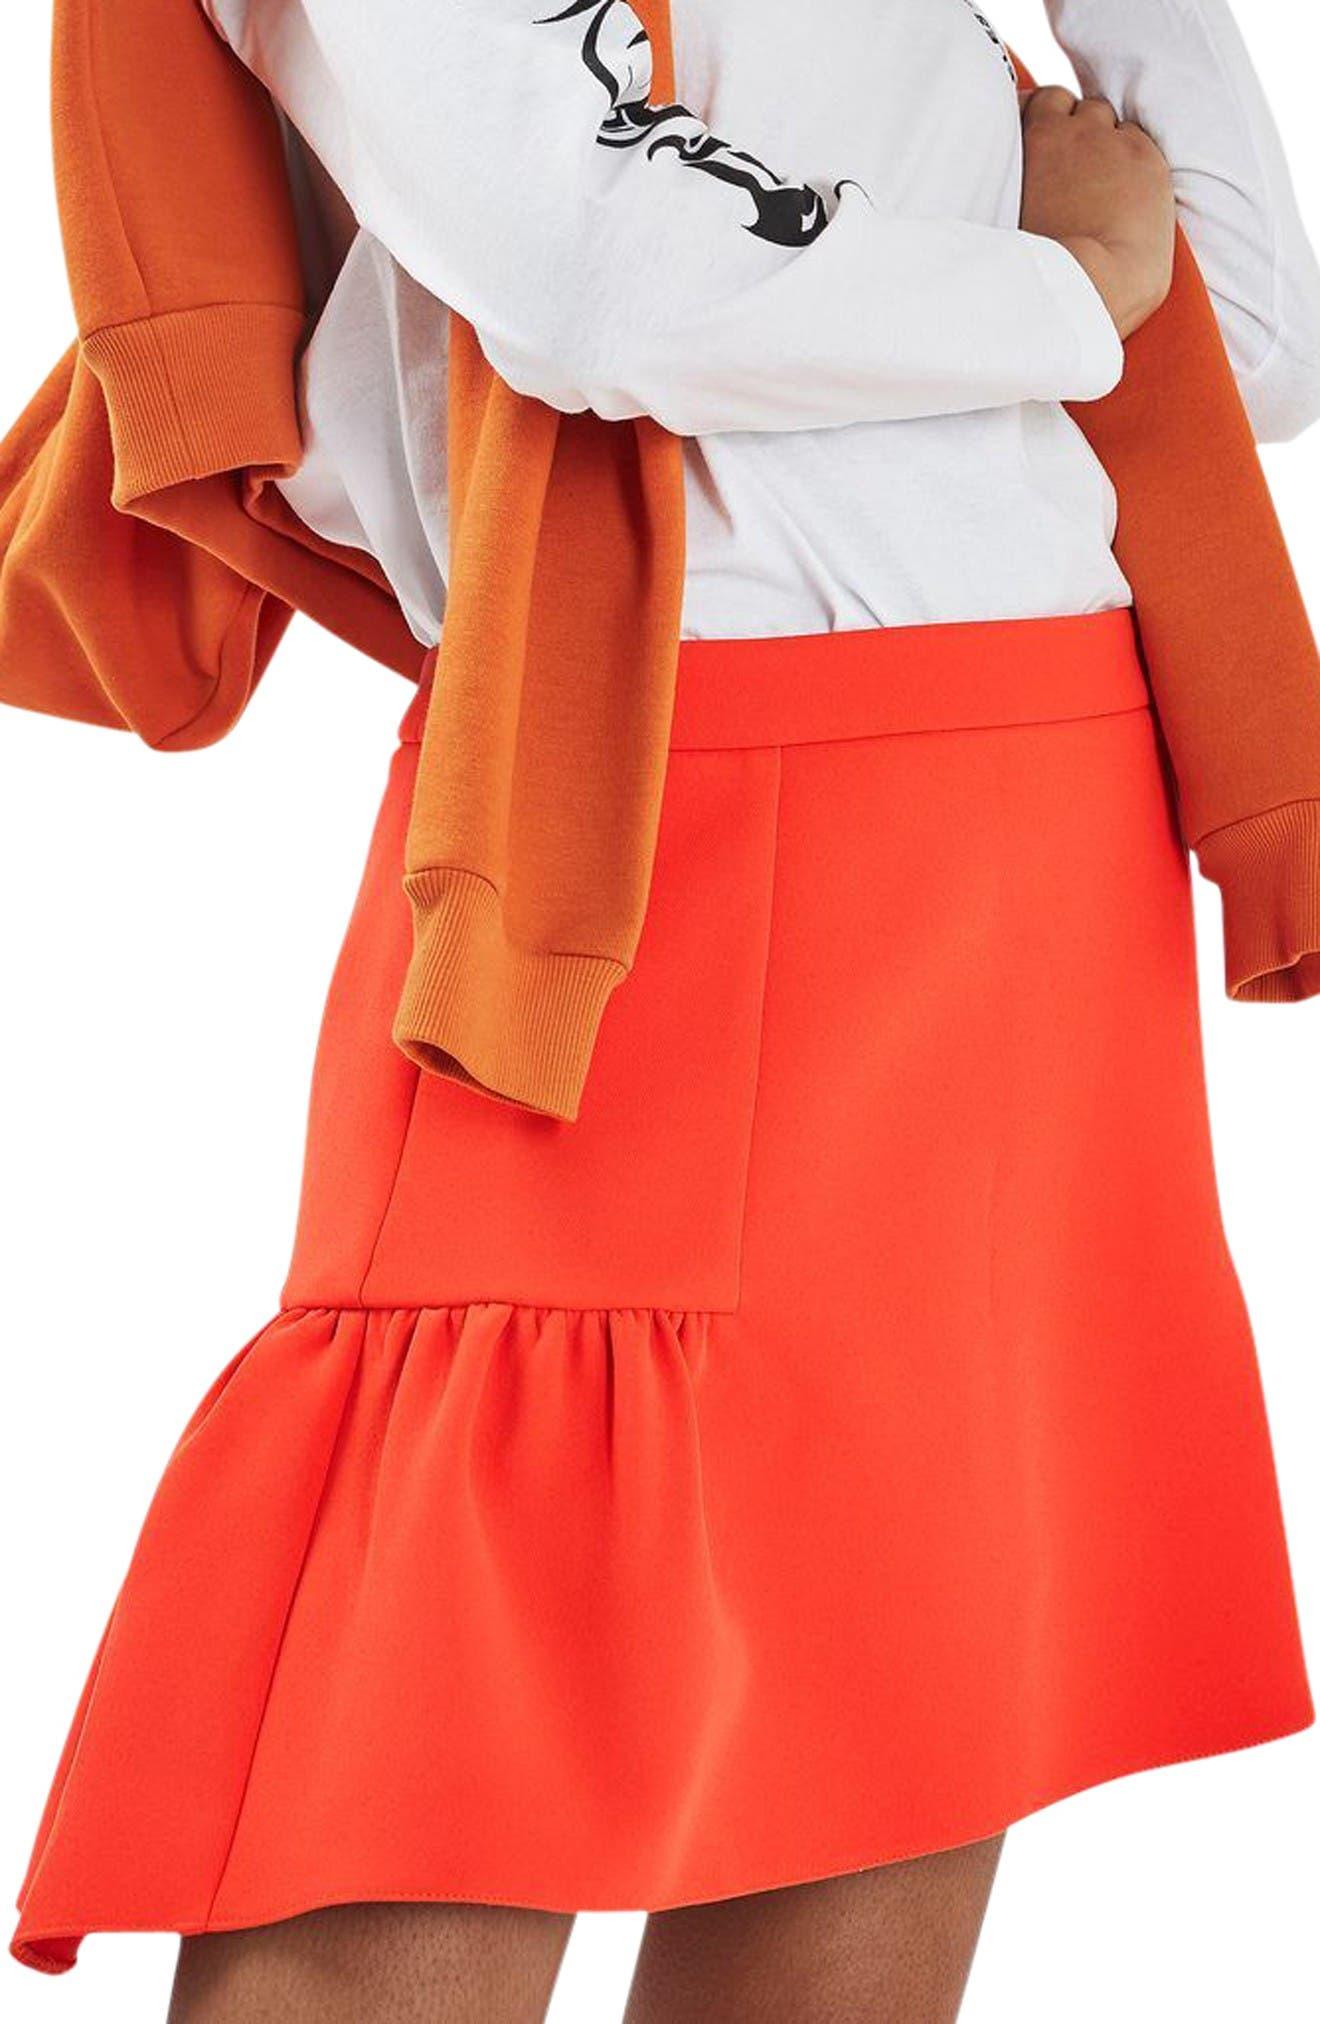 Main Image - Topshop Peplum Skirt